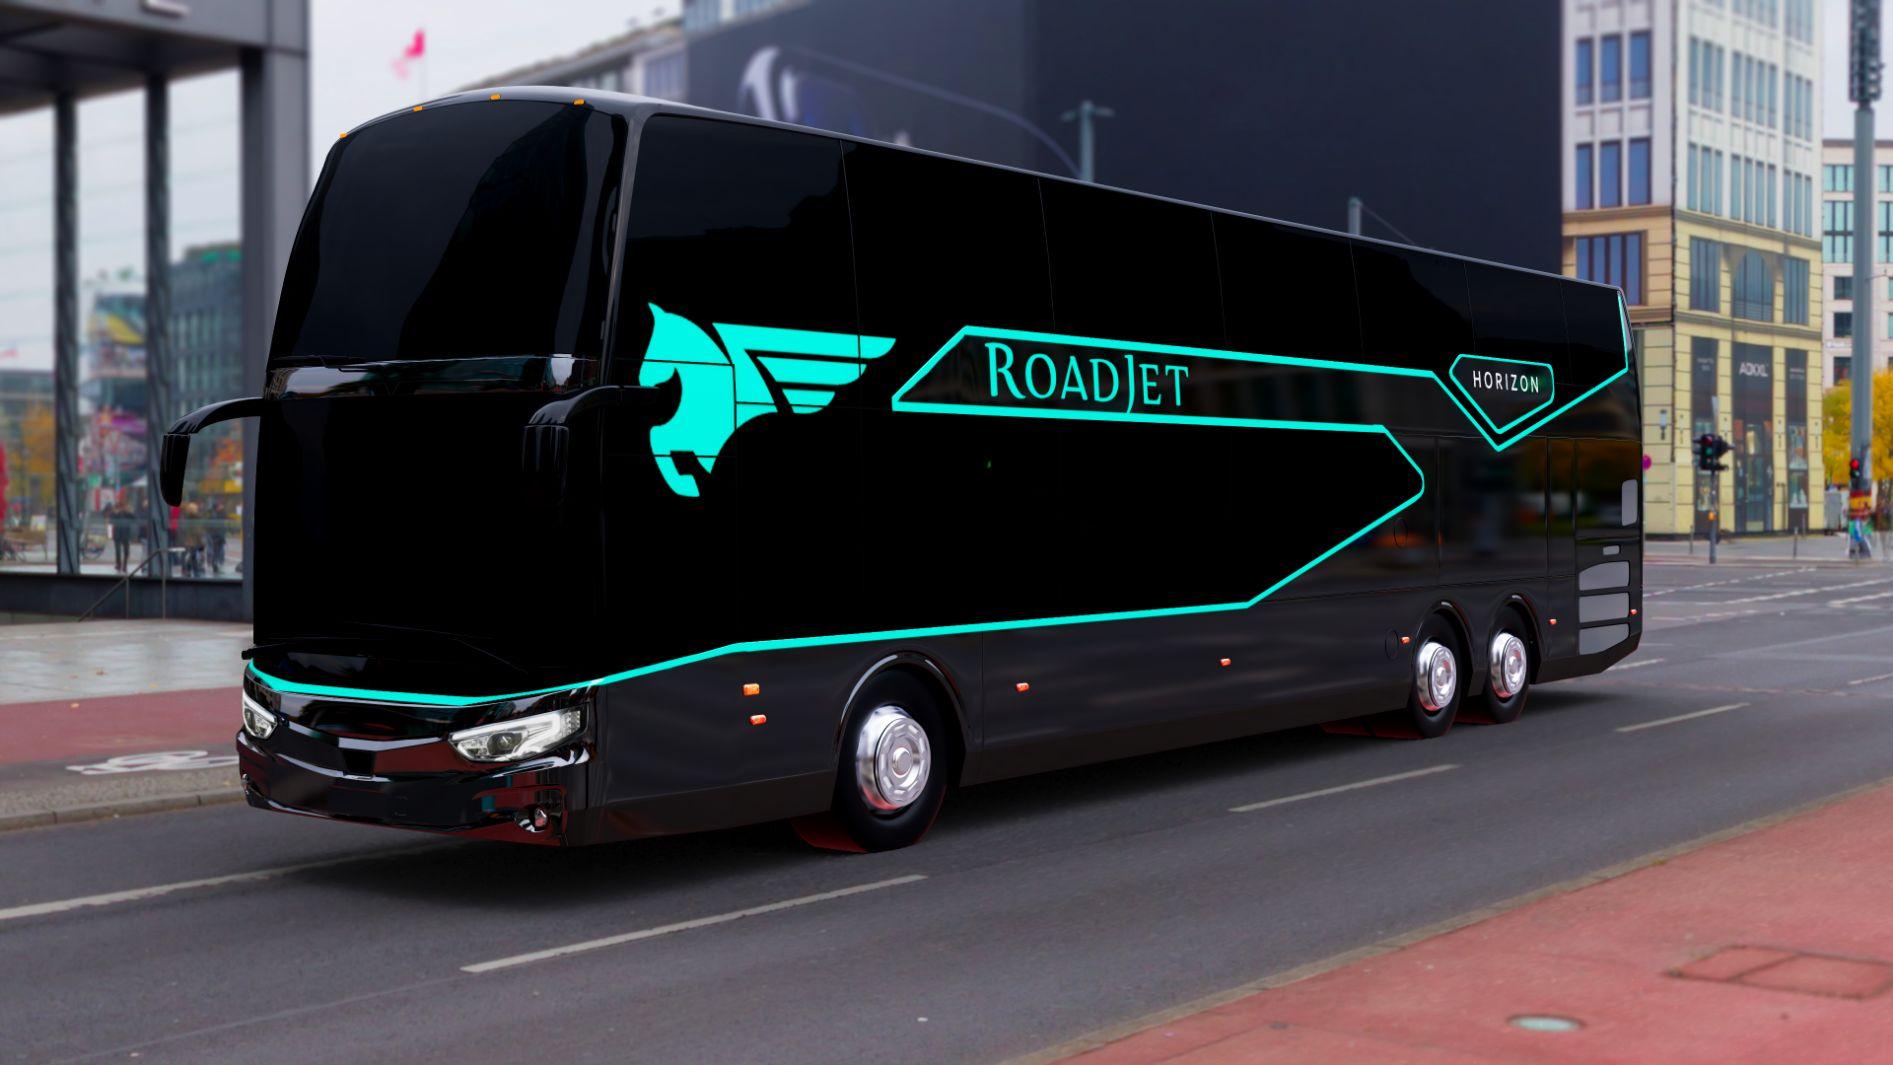 Roadjet_Startup_Fernbus_Gruender